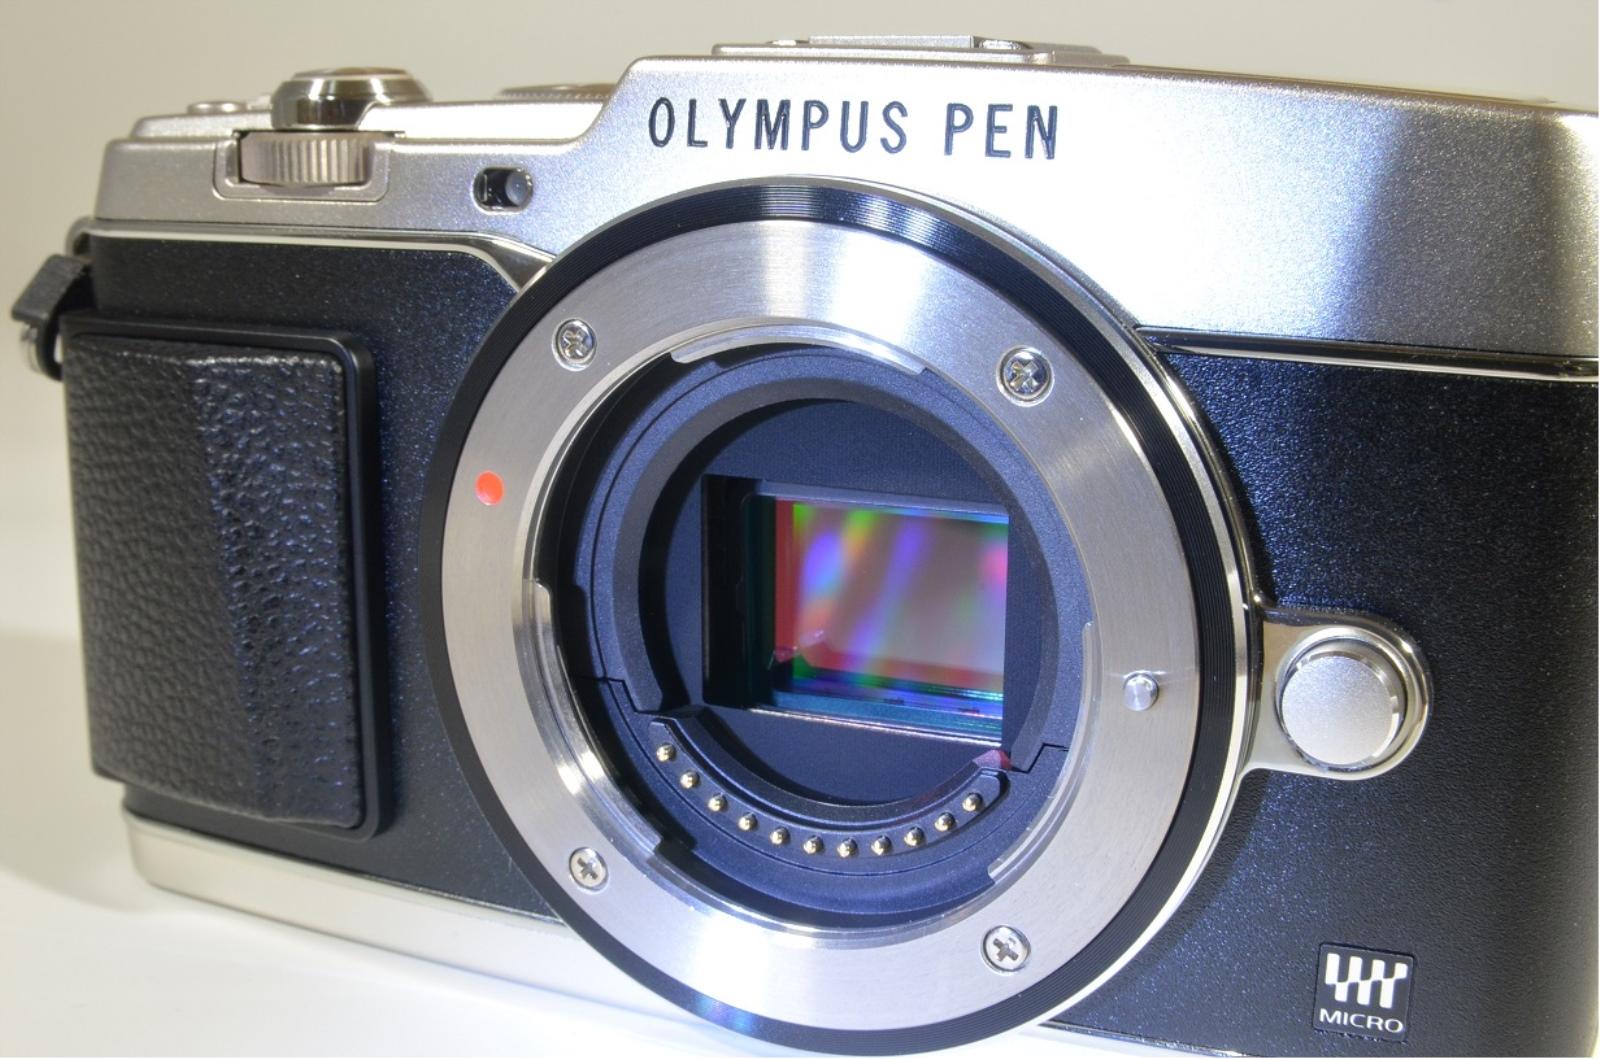 olympus pen e-p5 16mp mirrorless digital camera